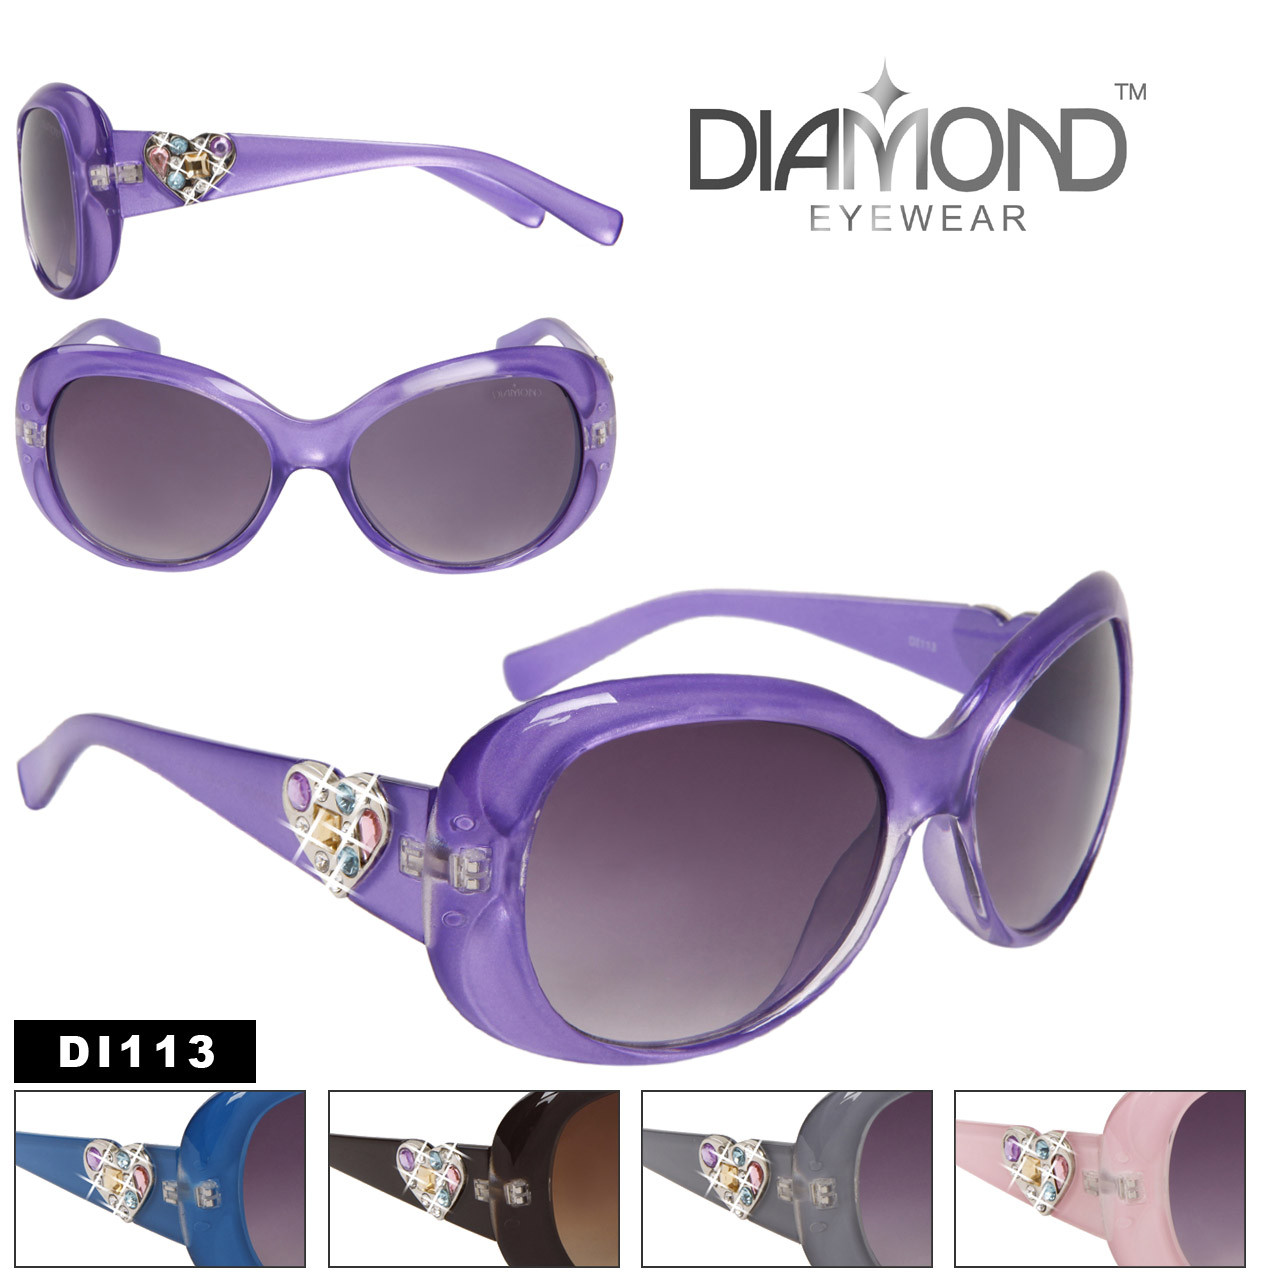 Diamond Eyewear NEW HEART RHINESTONE STYLE! DI113 (Assorted Colors) (12 pcs.)